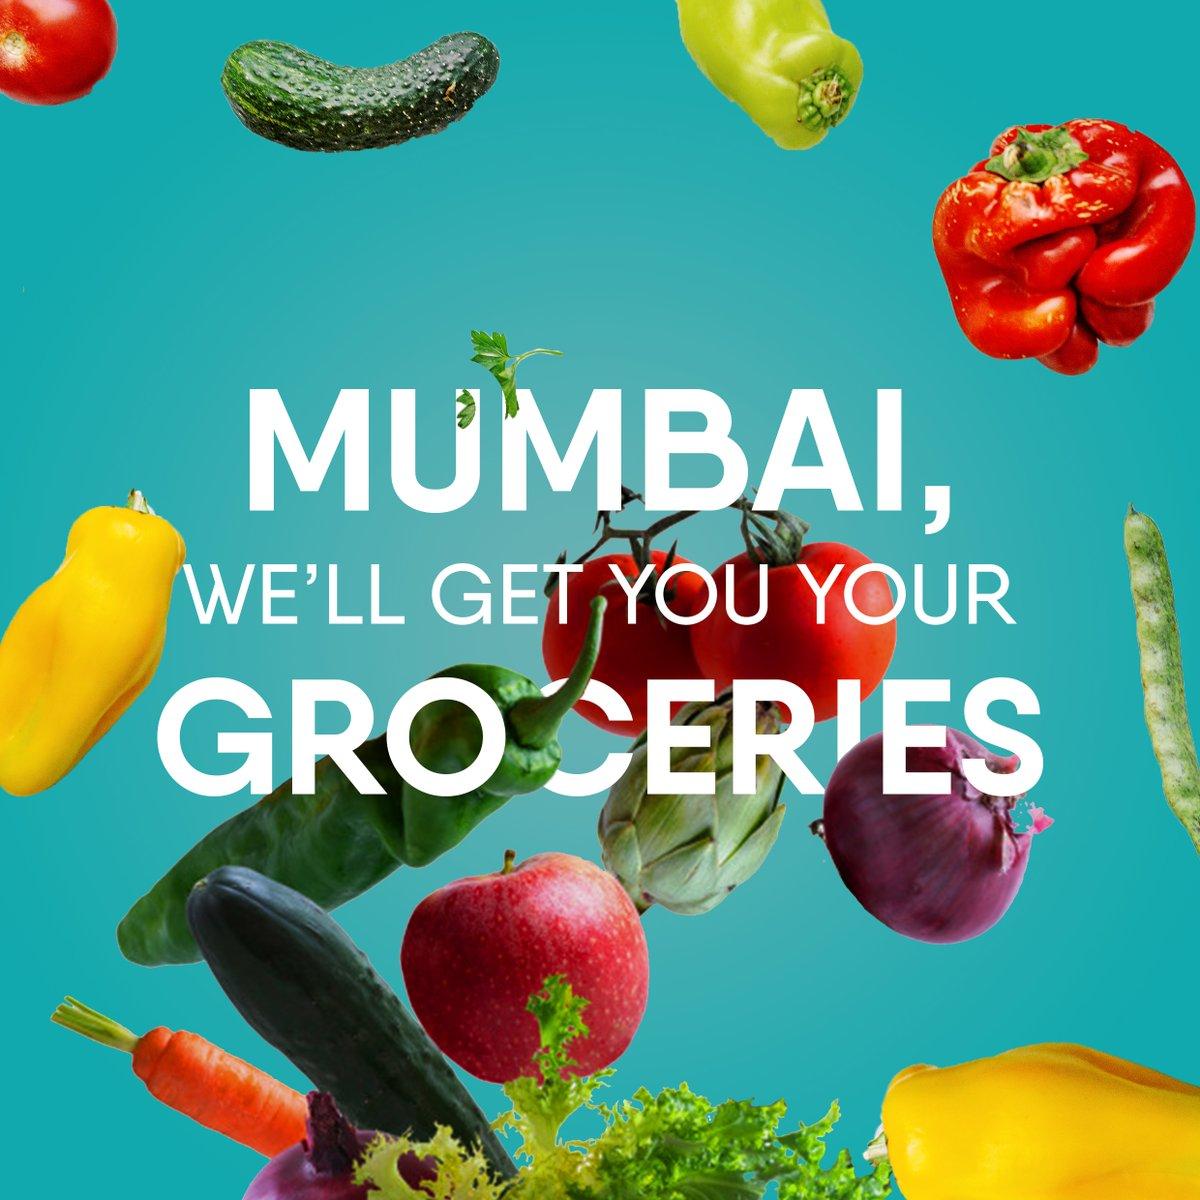 Kasa-kai Mumbai! Join the ride to get your groceries at your doorstep only on India's latest online shopping destination YesGenie! #WishKarkeTohDekho  #mondaythoughts #Mondayvibes #mumbai #onlineshopping #groceries